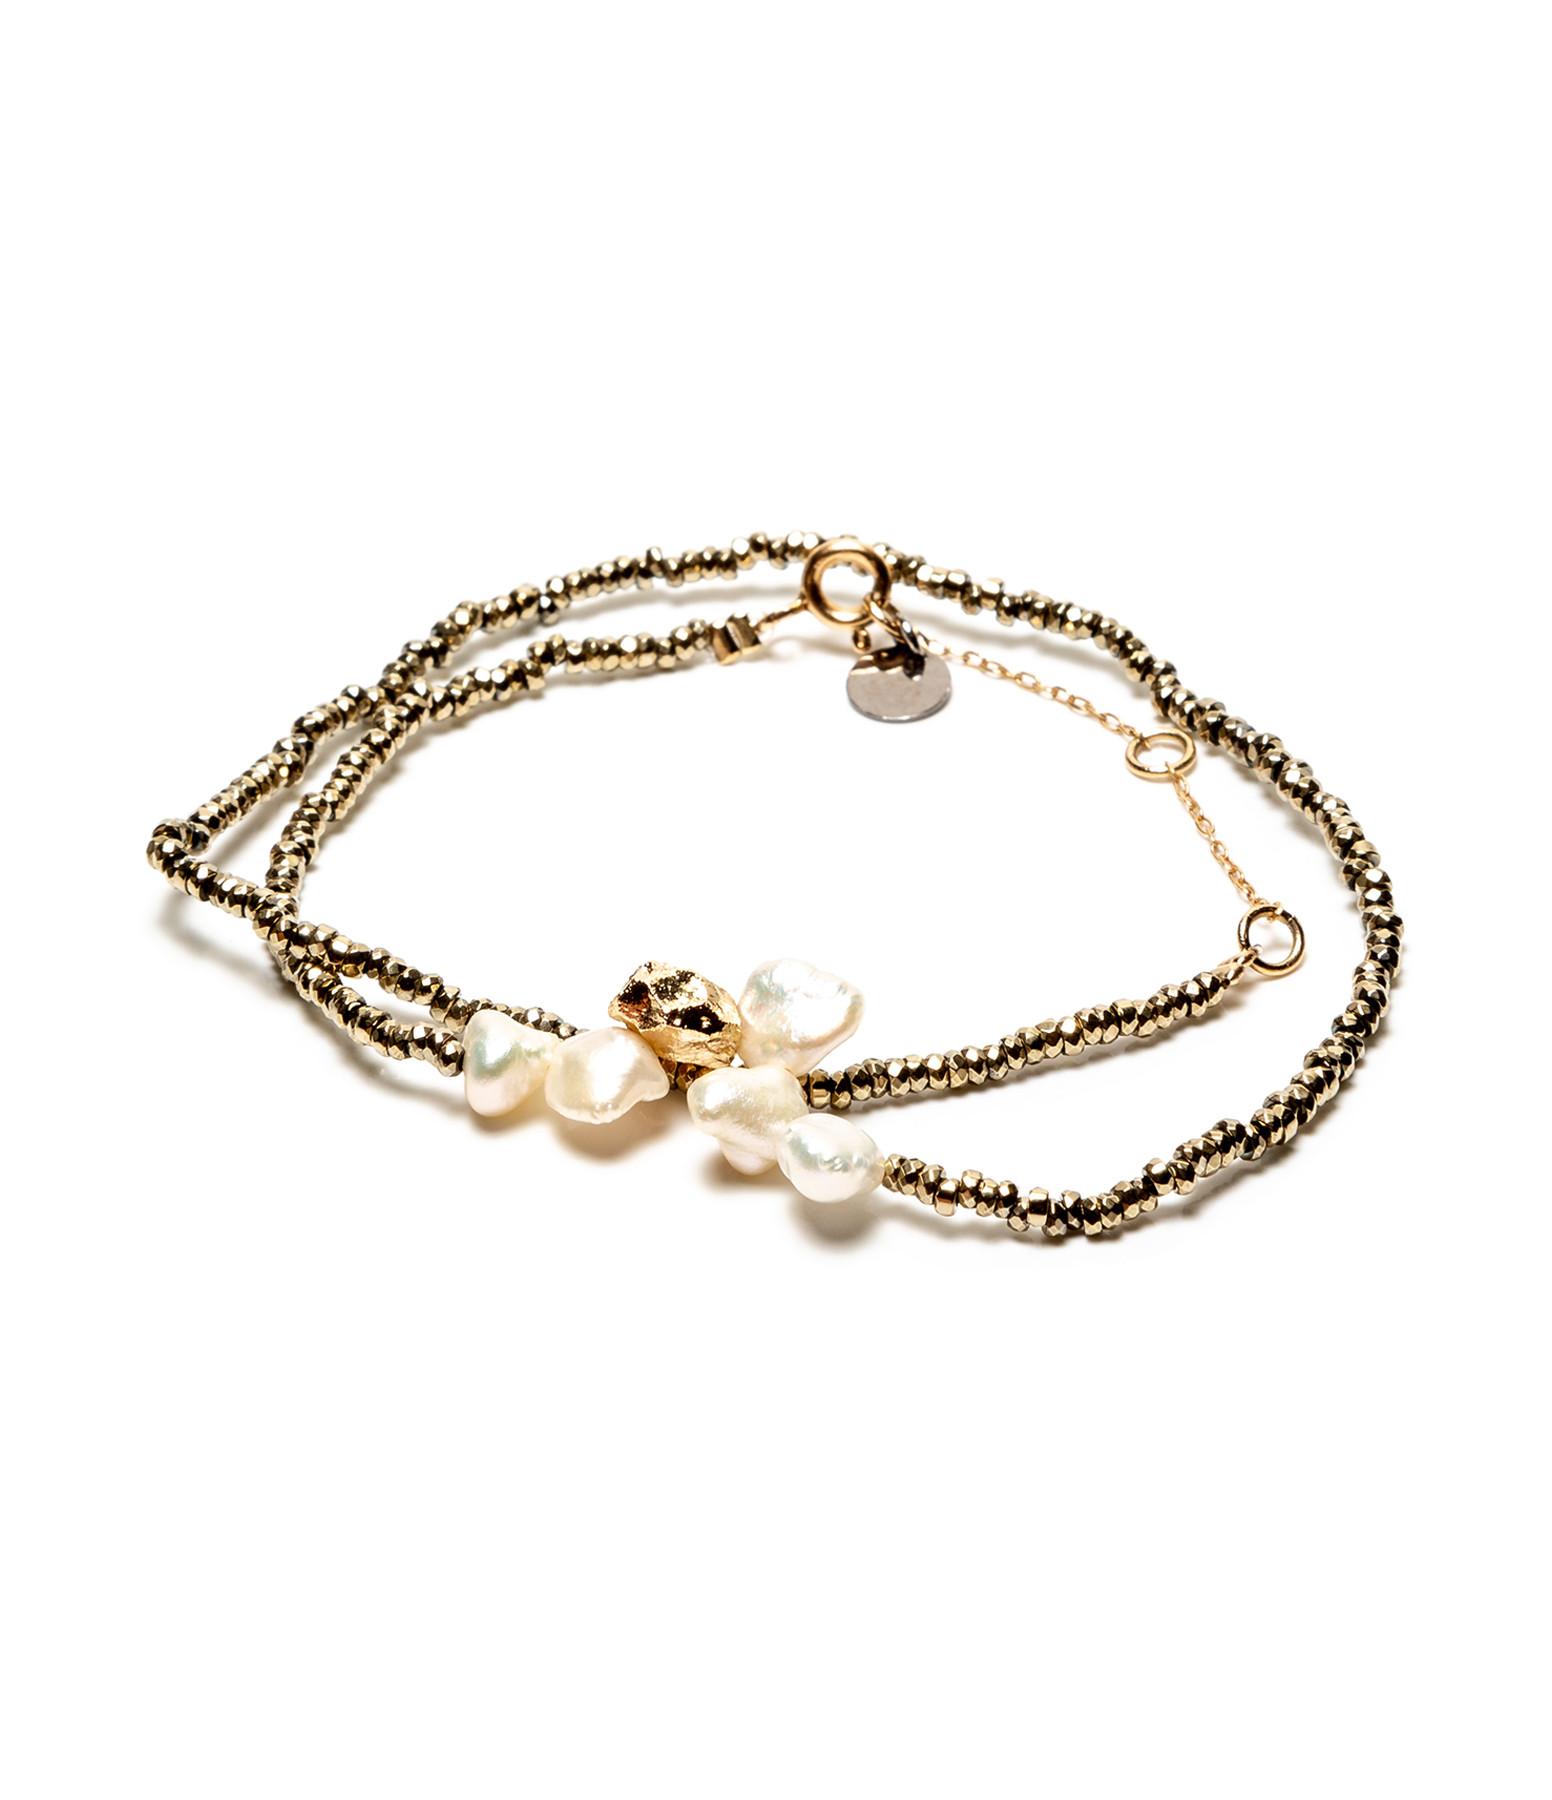 LSONGE - Bracelet Double Perle Blanche Hématite Kaki AGD